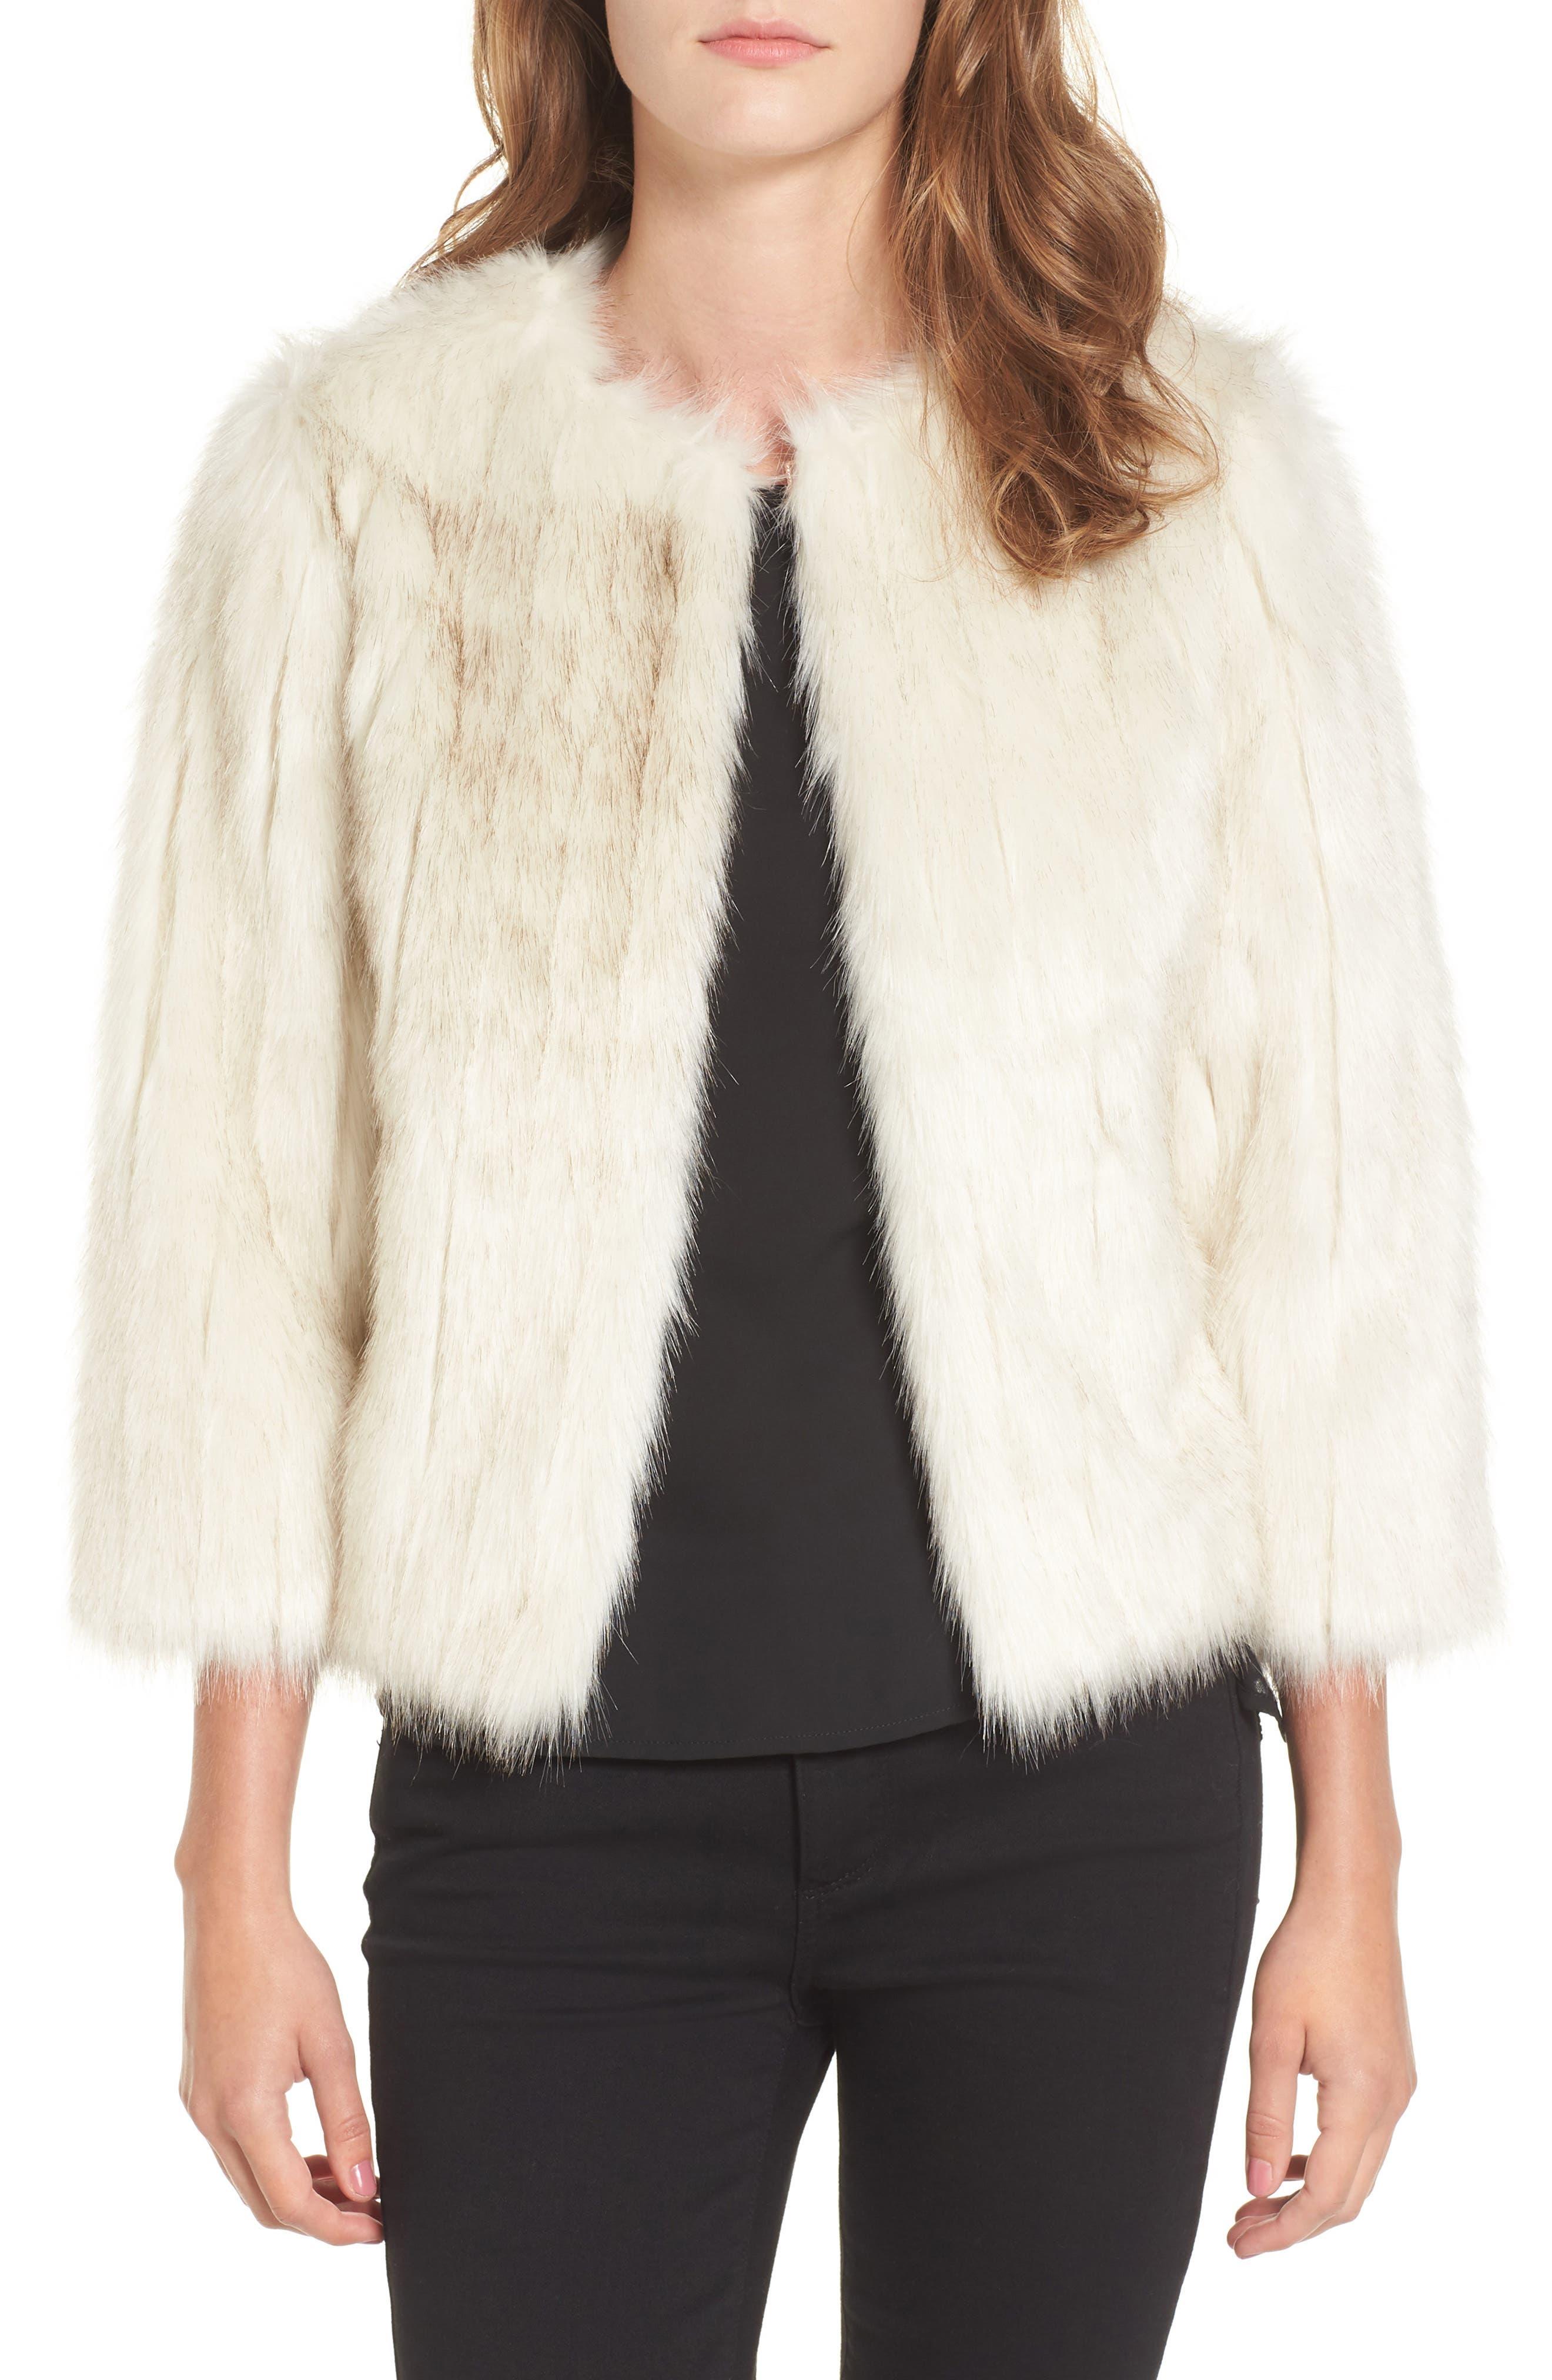 Winter Faux Fur Jacket,                         Main,                         color, Ivory